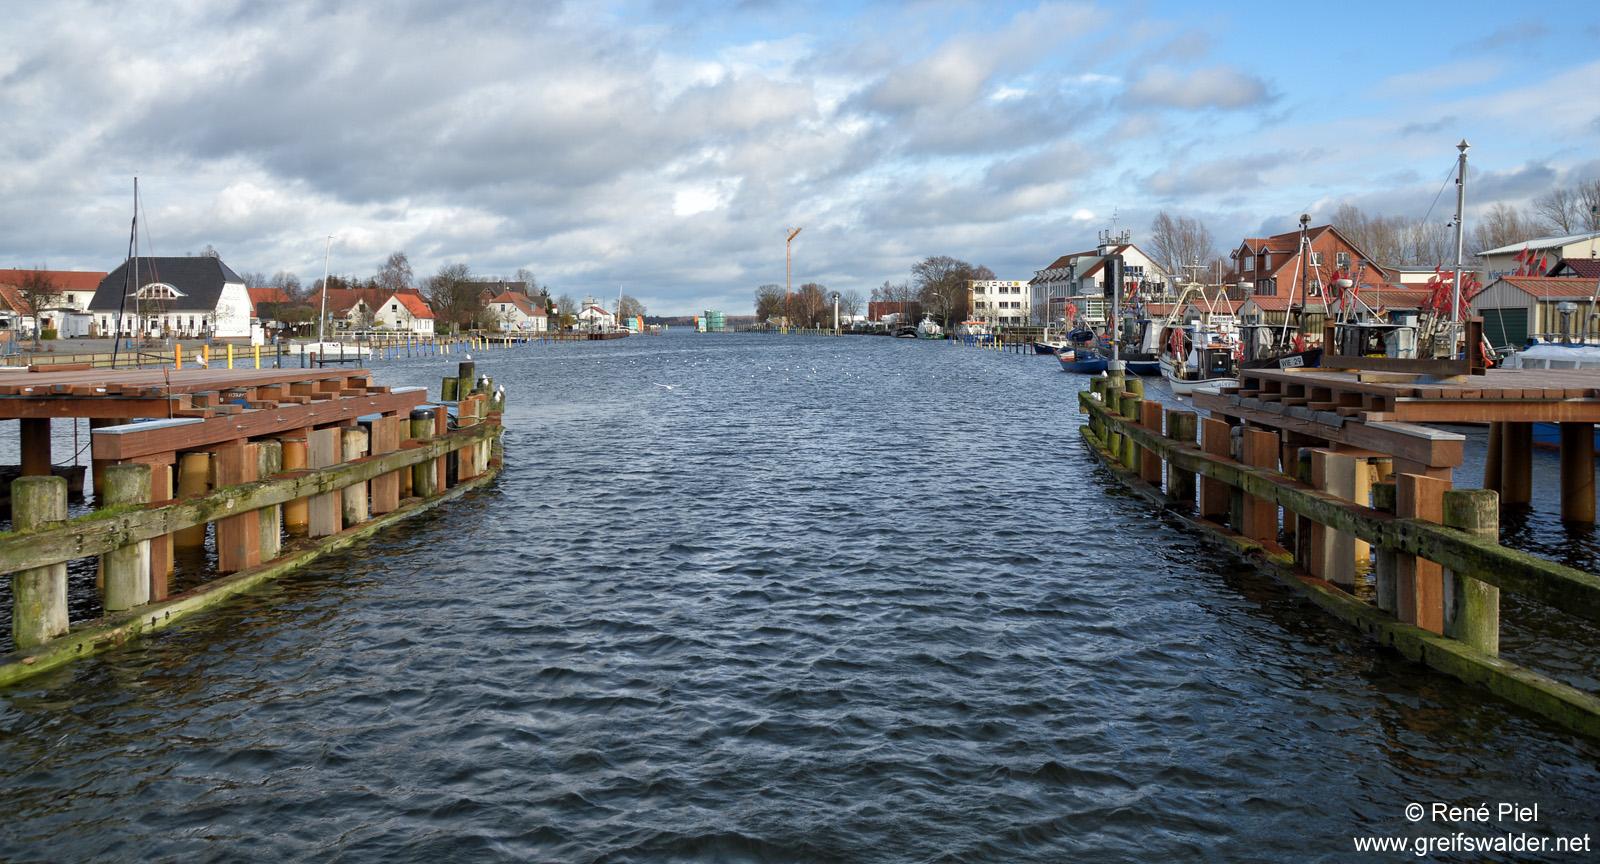 Baustelle Brücke in Greifswald-Wieck